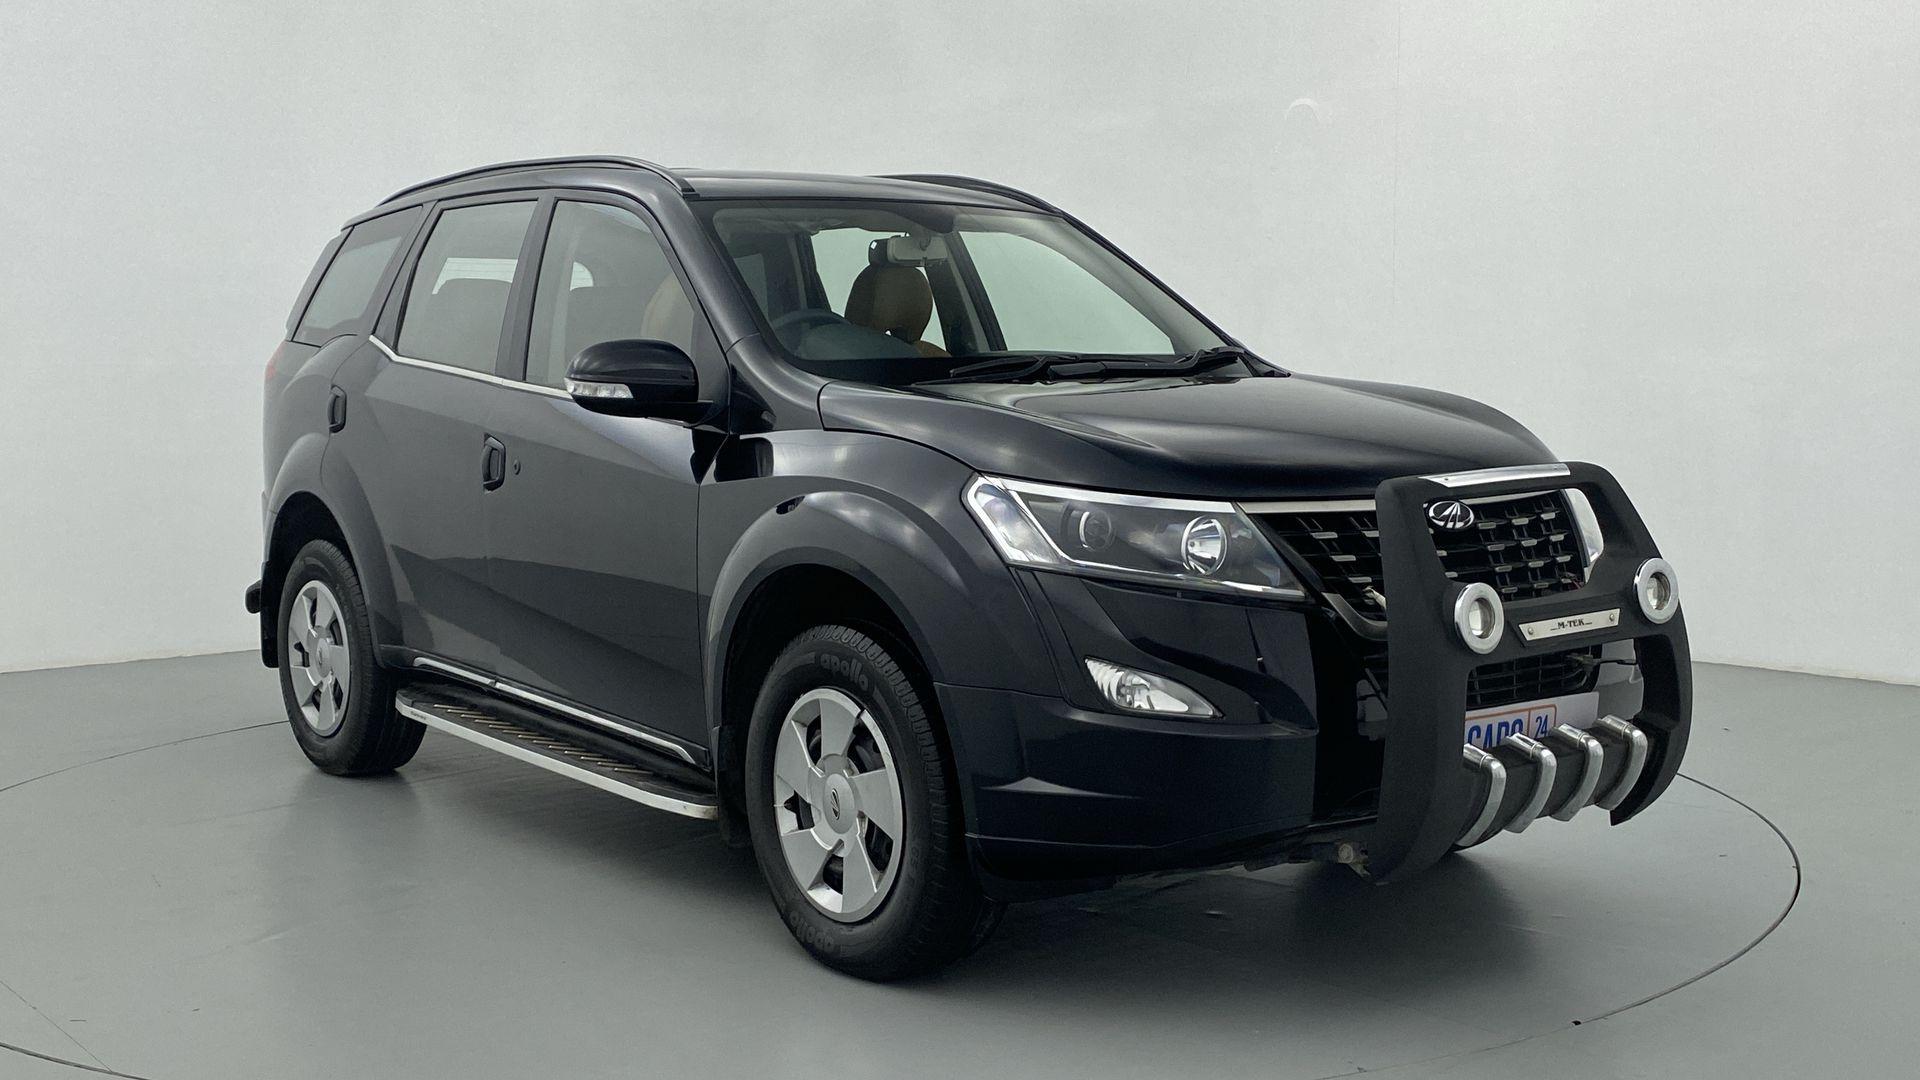 2019 Mahindra XUV500 W5 FWD